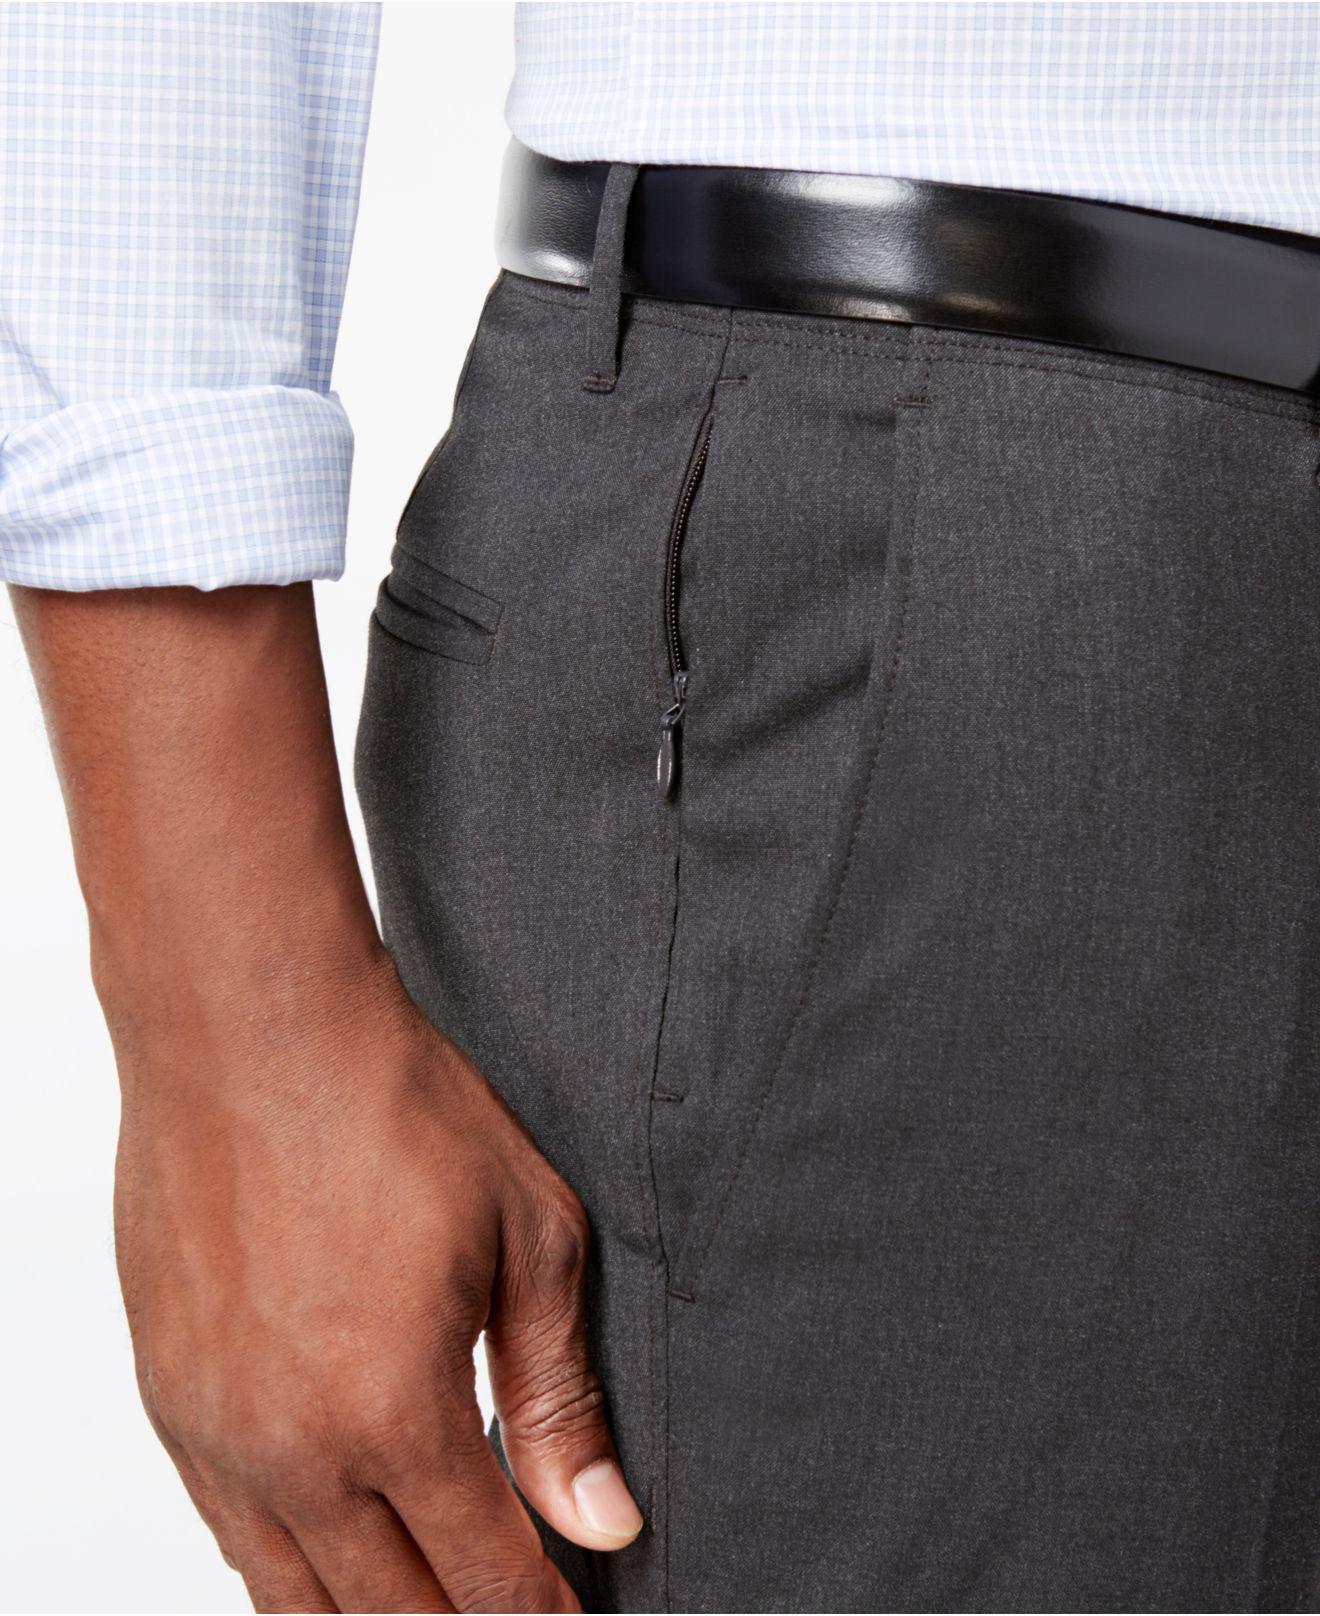 889bb4b702b0 Kenneth Cole Reaction - Gray Men s Stretch Athleisure Slim-fit Dress Pants  for Men -. View fullscreen